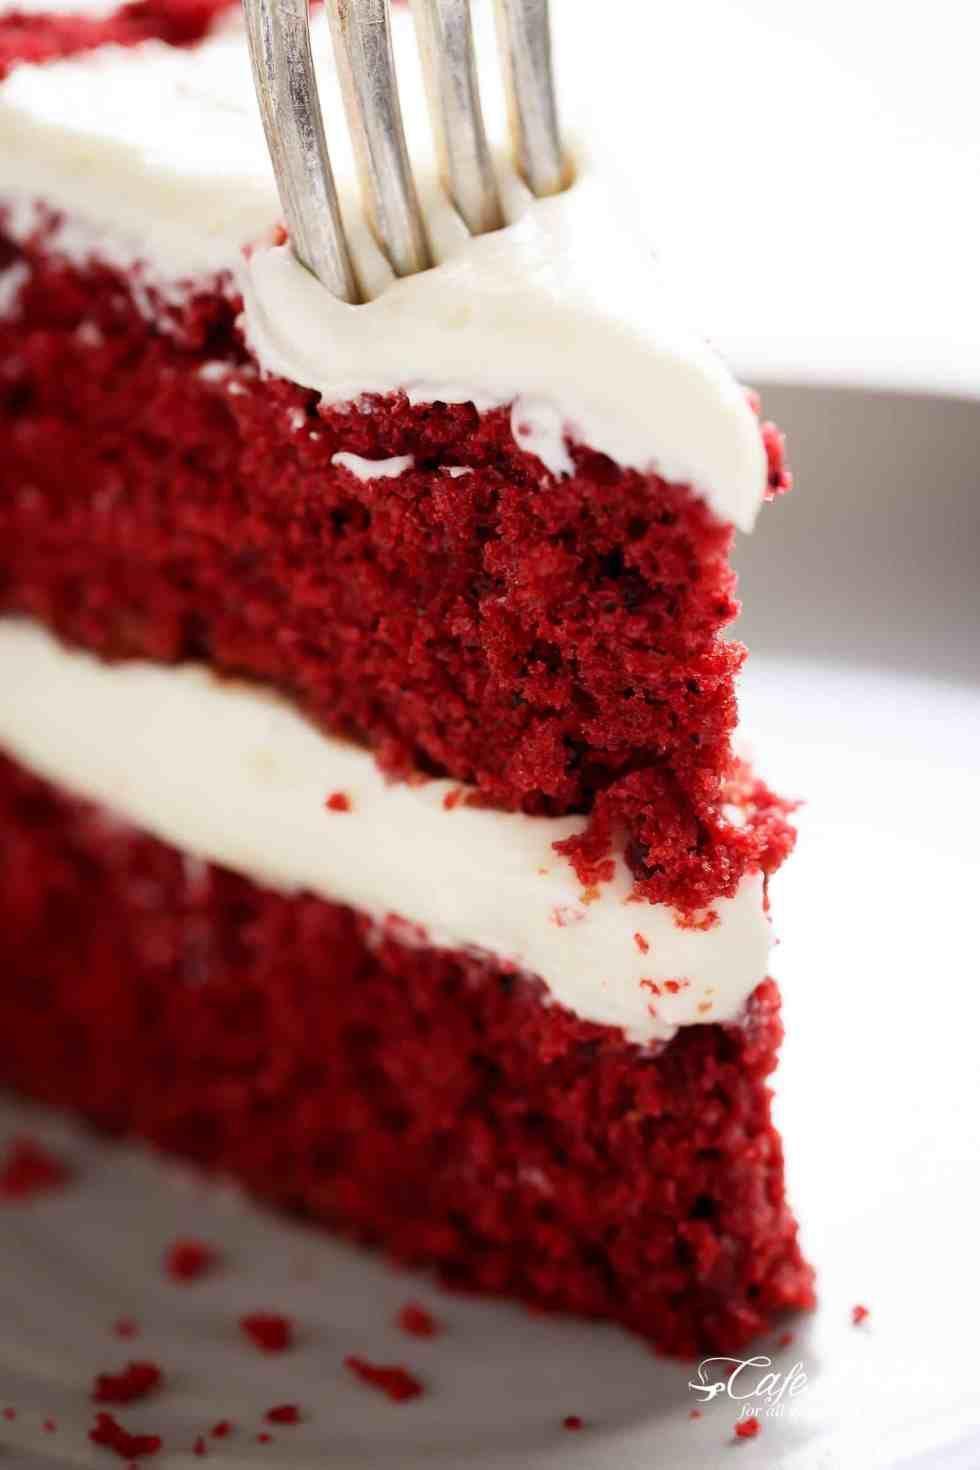 Red Velvet Cake Cafedelites Com Best Red Velvet Cake Red Velvet Cake Red Velvet Cake Recipe